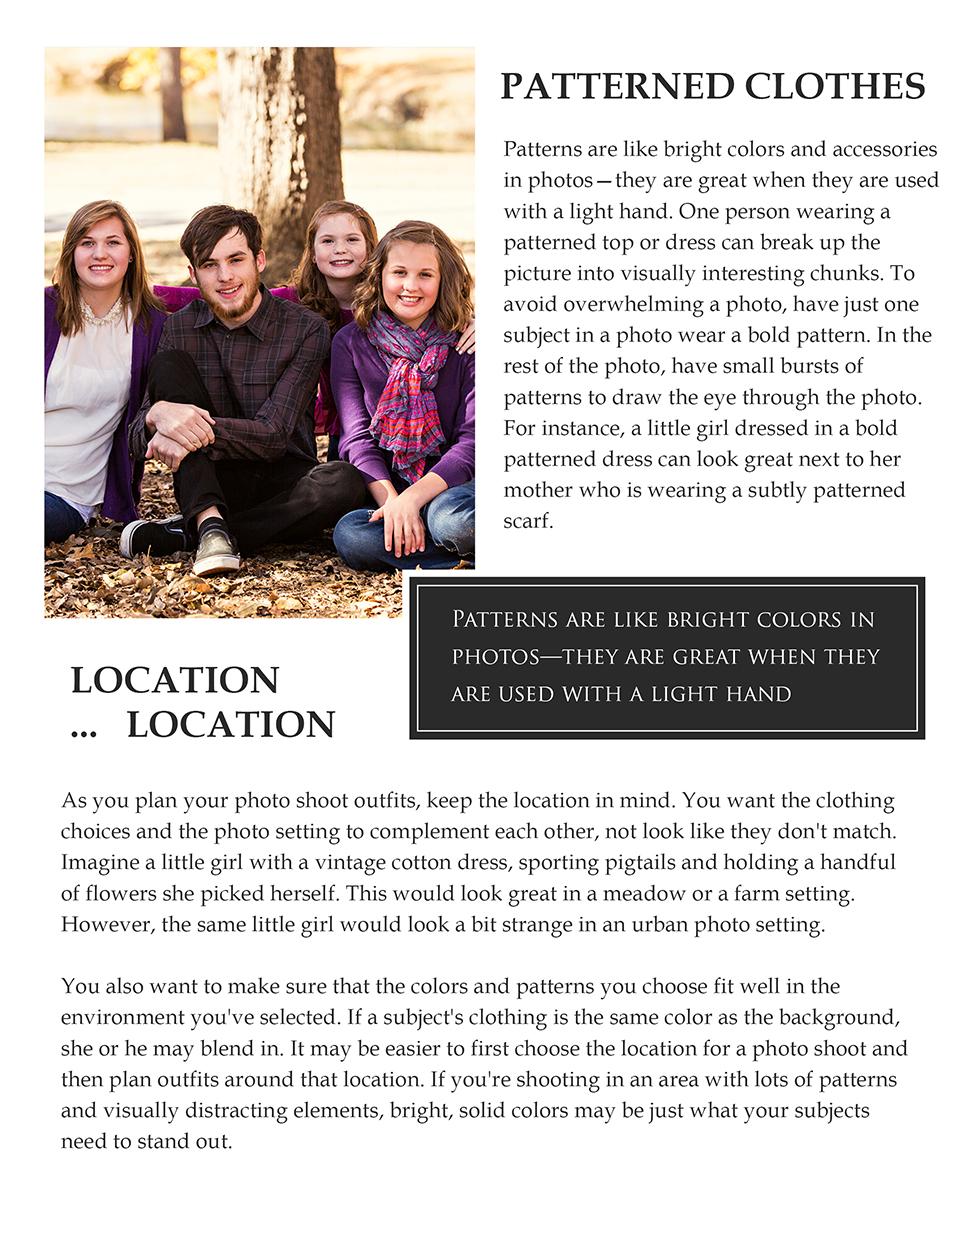 whattowear page 10